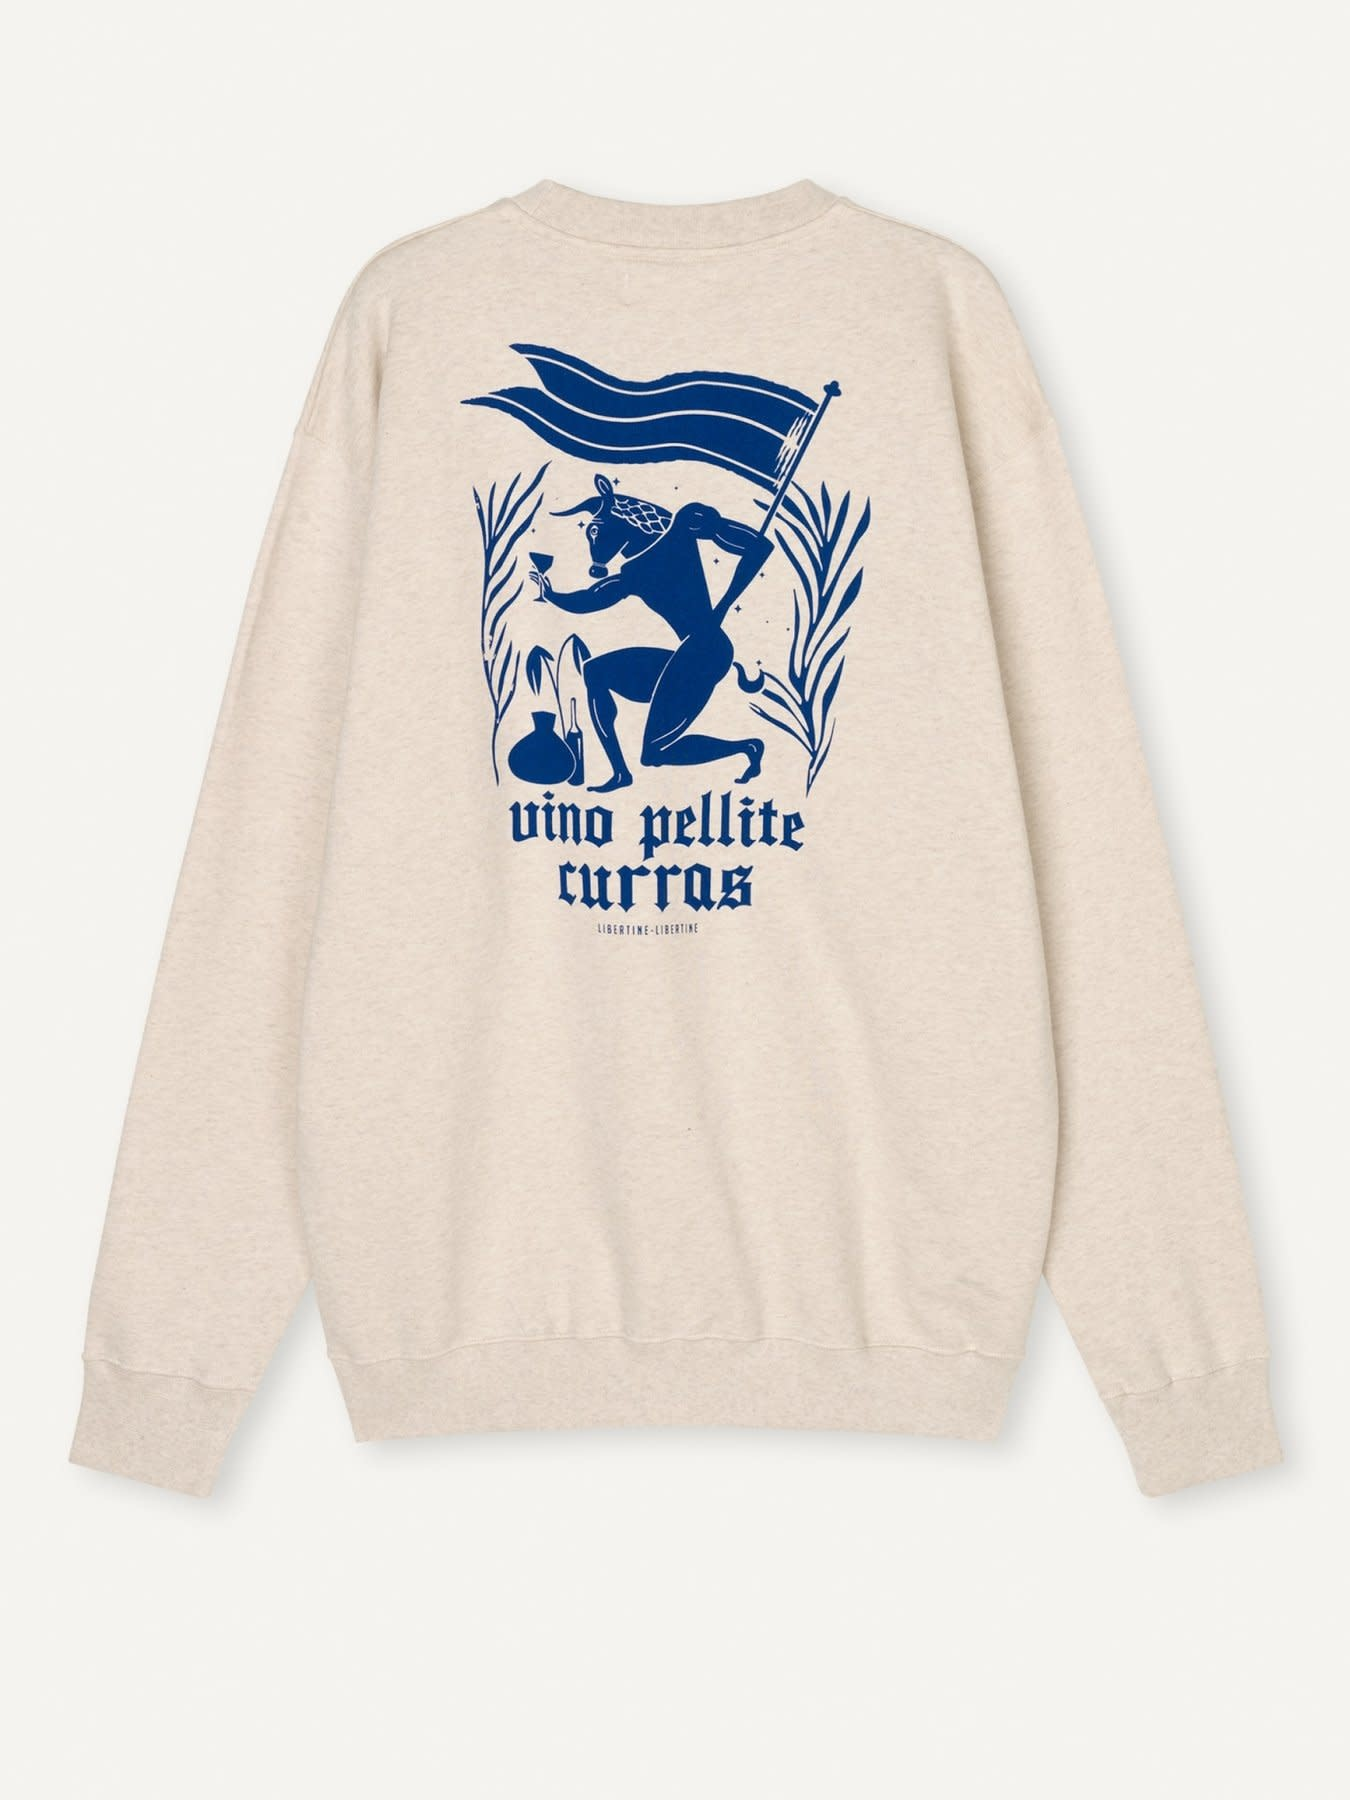 Society Pellite Sweatshirt Ecru Wit-2